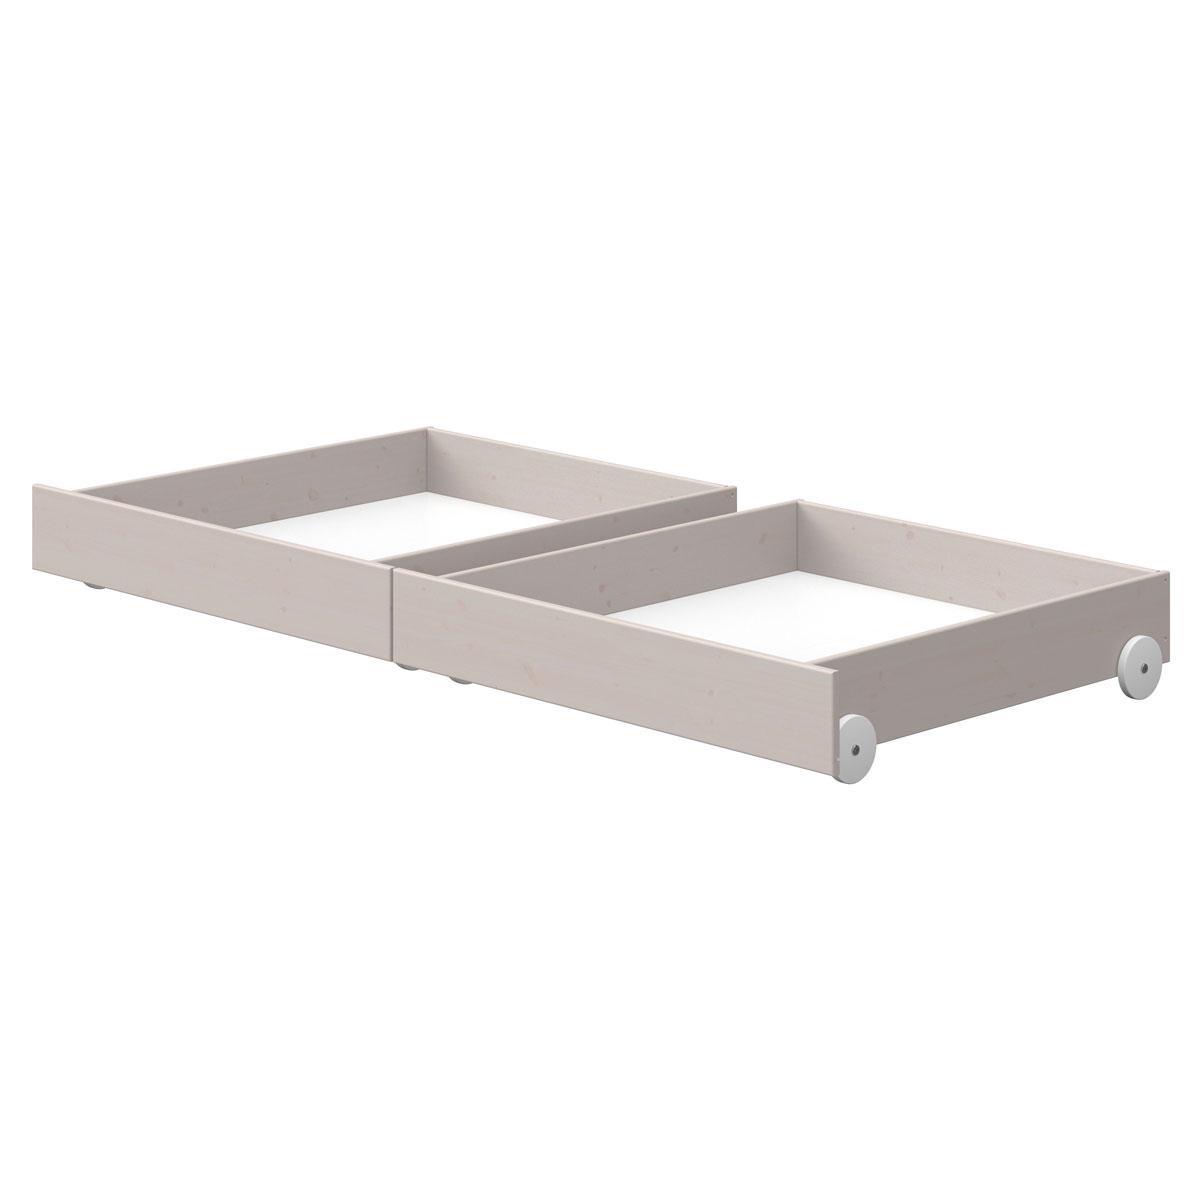 2 Schubladen Bett 90x200cm CLASSIC Flexa grey washed